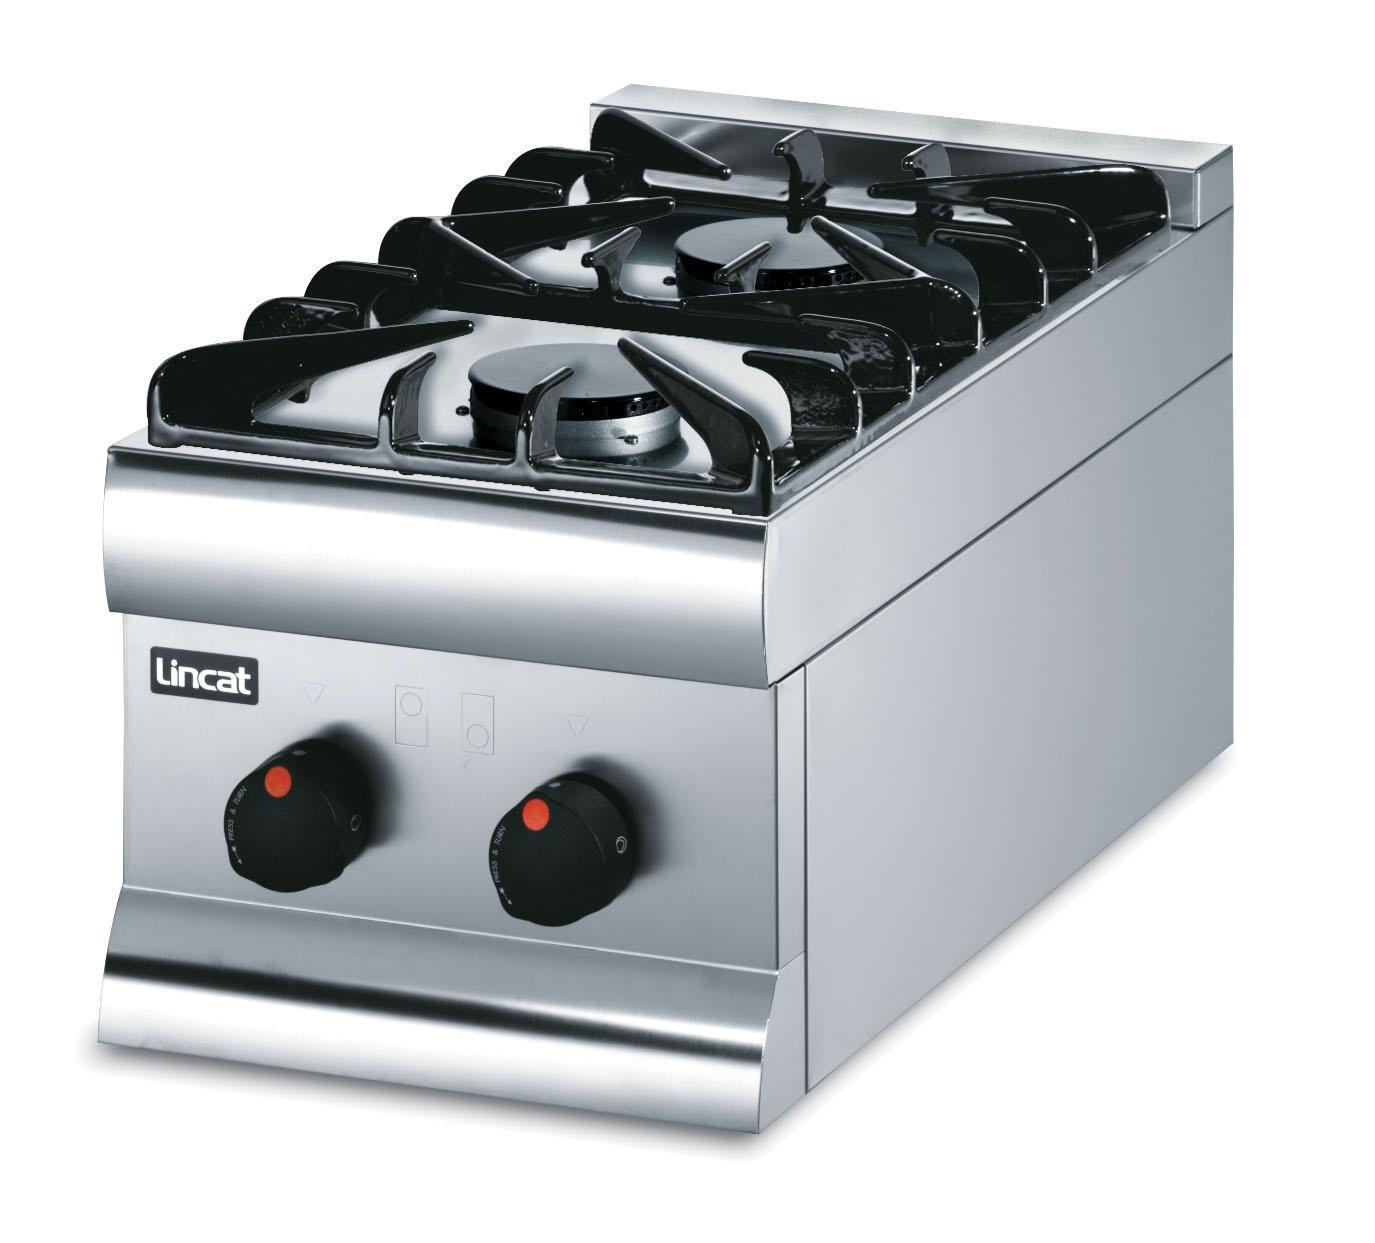 Lincat Silverlink 600 - 2 gas burner - Dentons